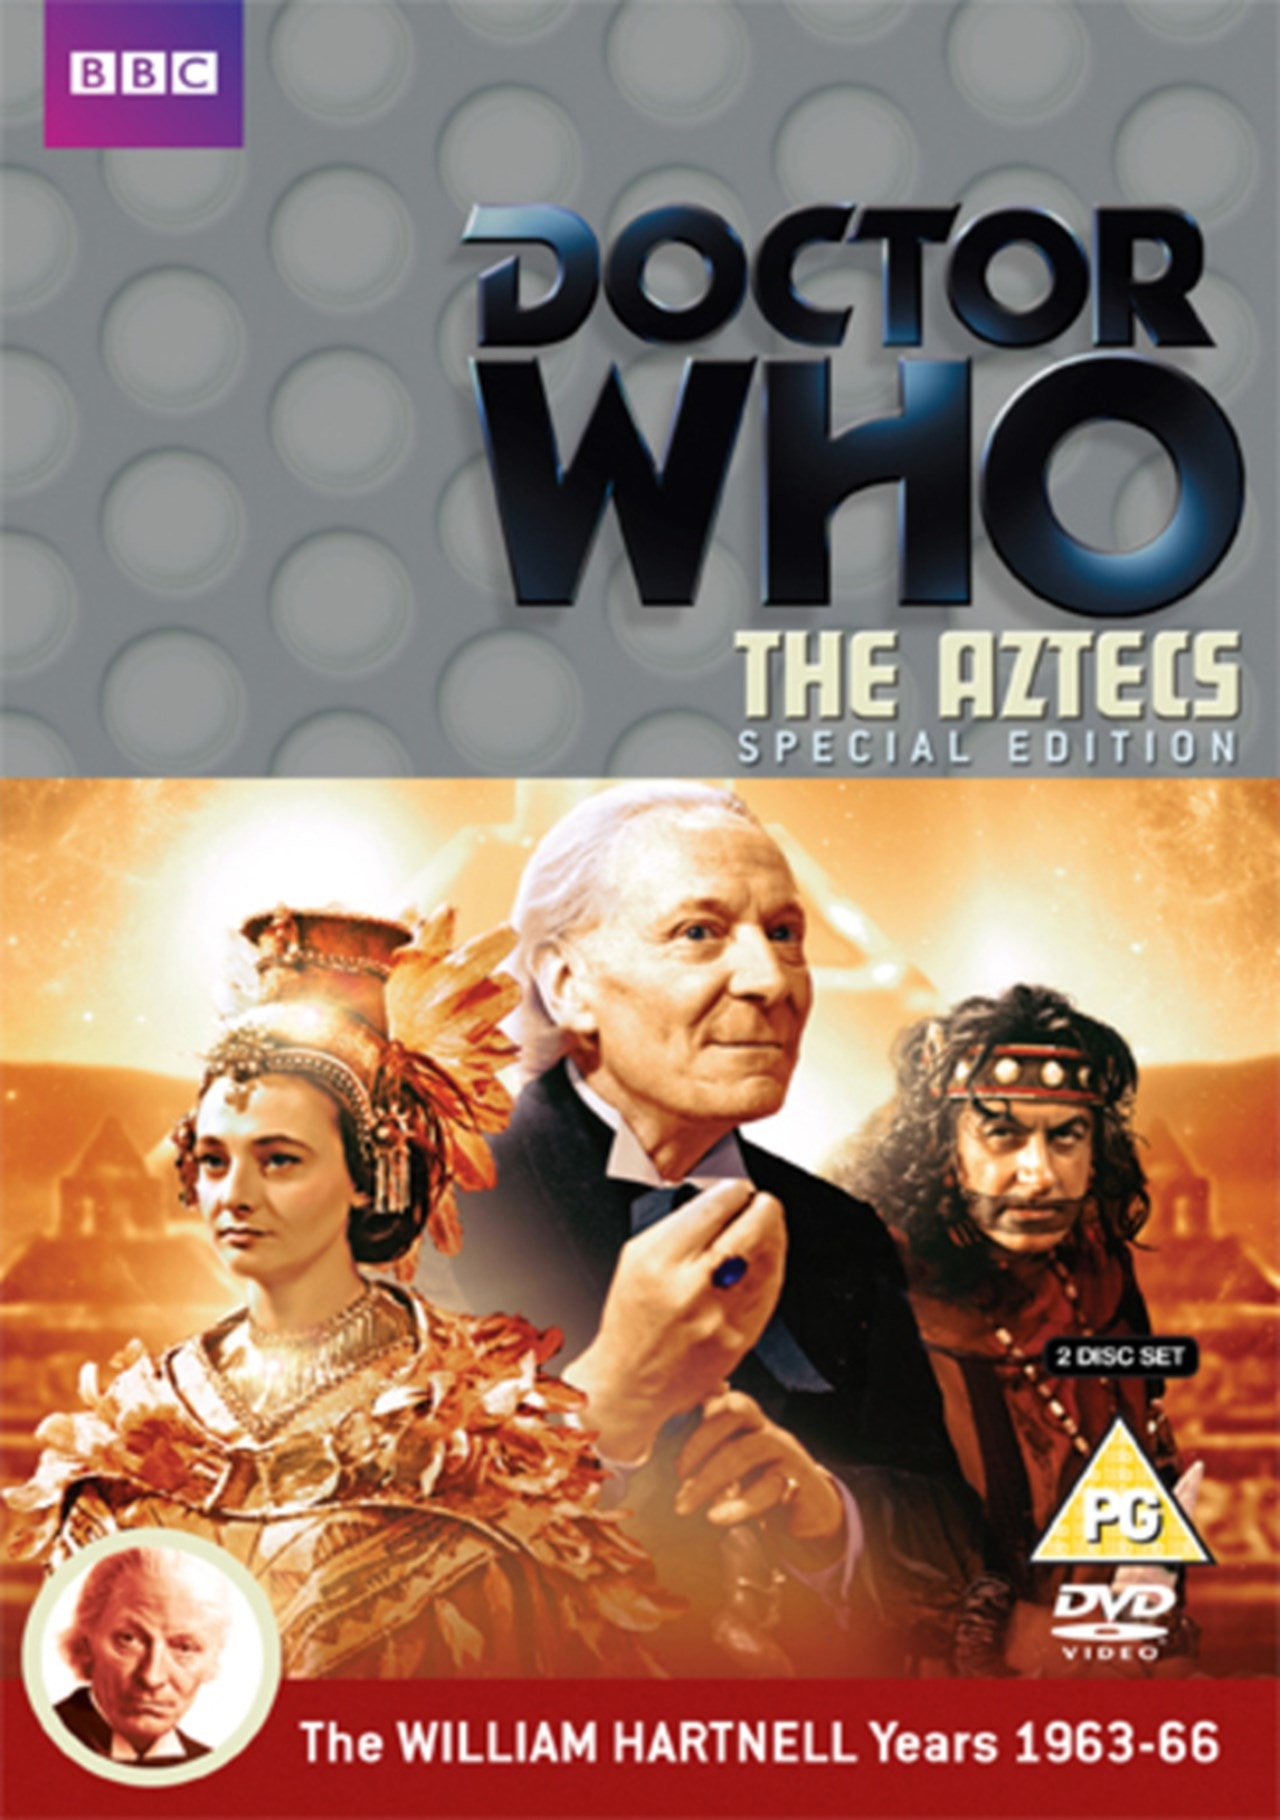 Doctor Who: The Aztecs - 1